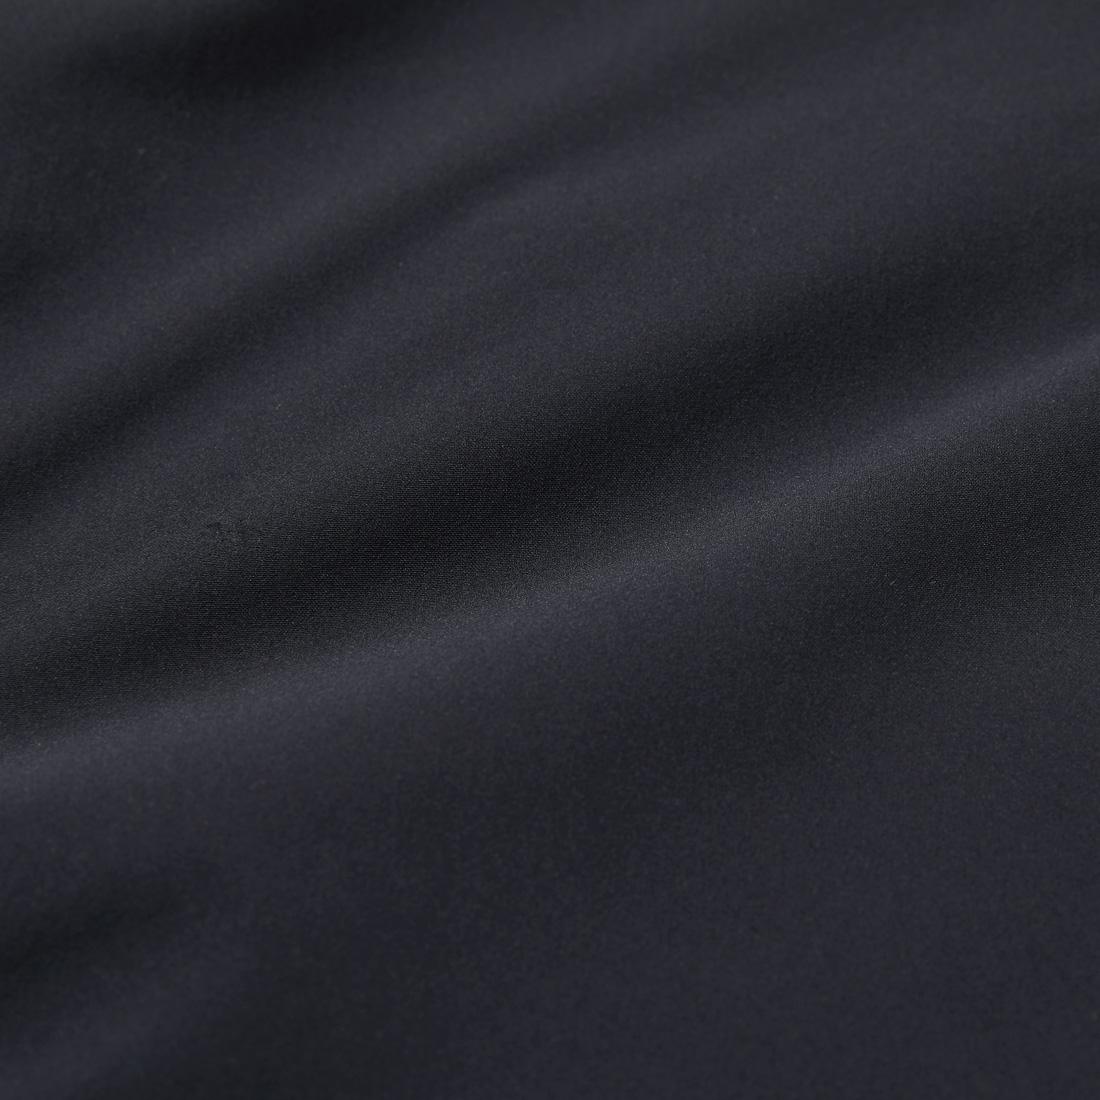 borderless no-collar jacket -male-の商品写真12